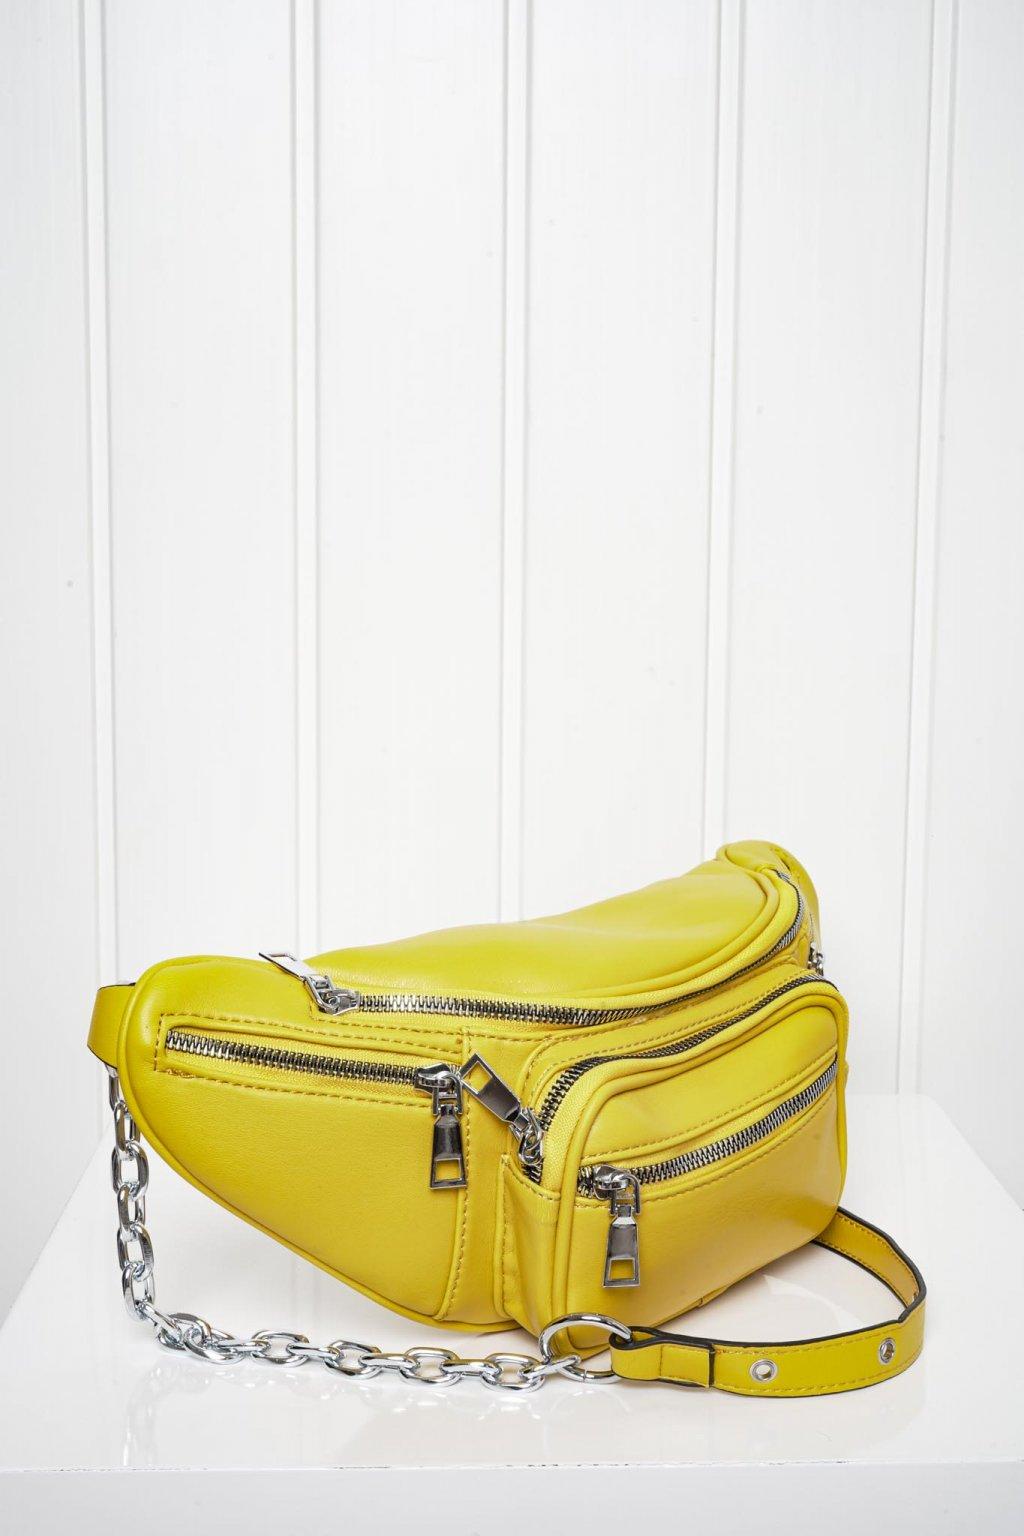 Kabelka, crossbody, ruksak, shopping bag, shopperka, 136